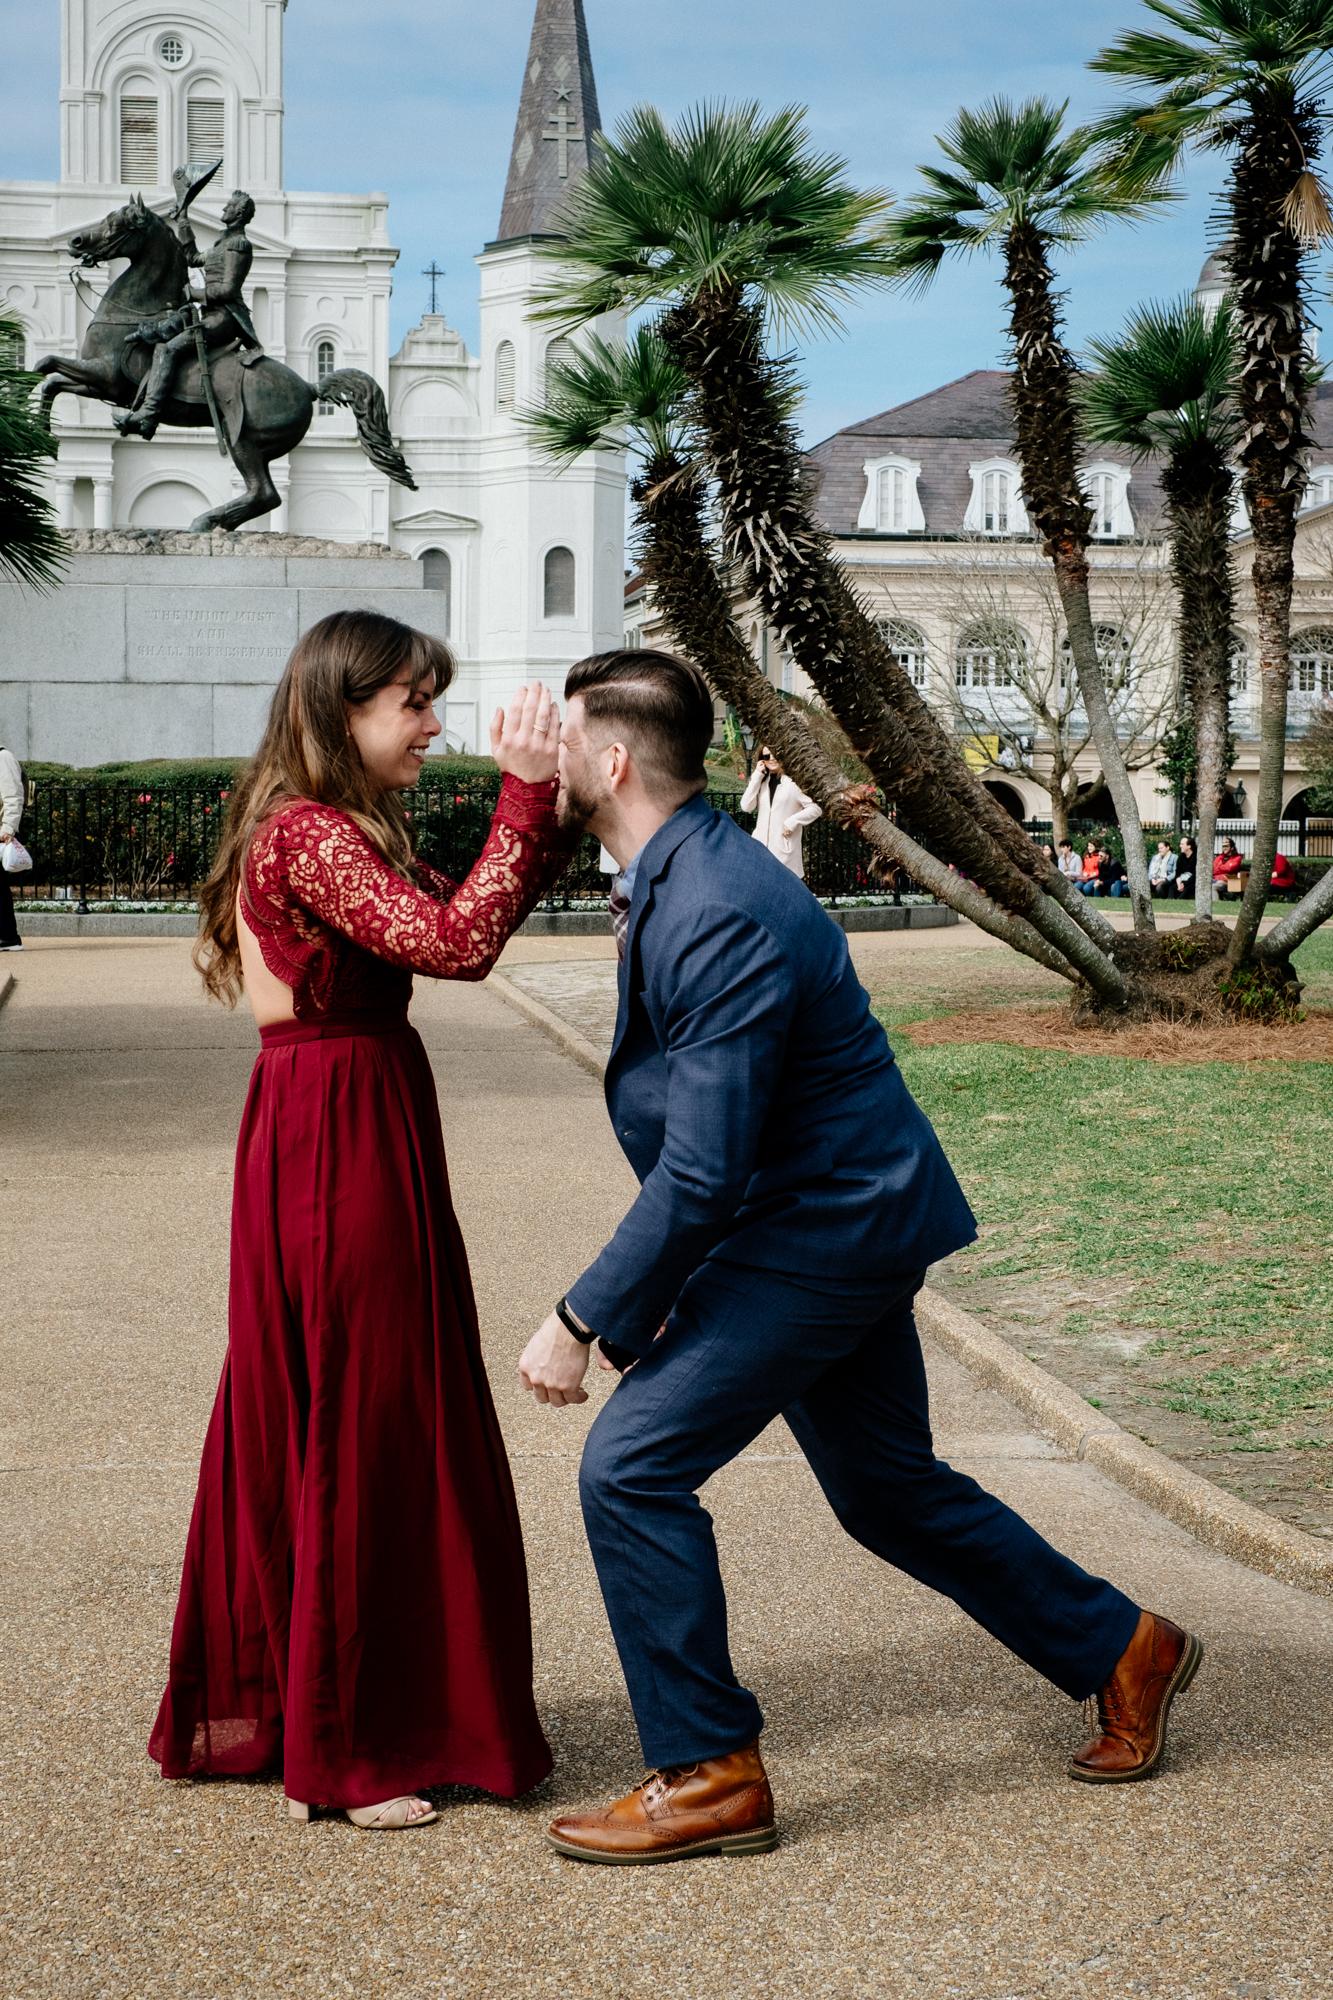 Jen_Montgomery_Photography_Angela_Brian_Engagement_Proposal_FB-18.jpg